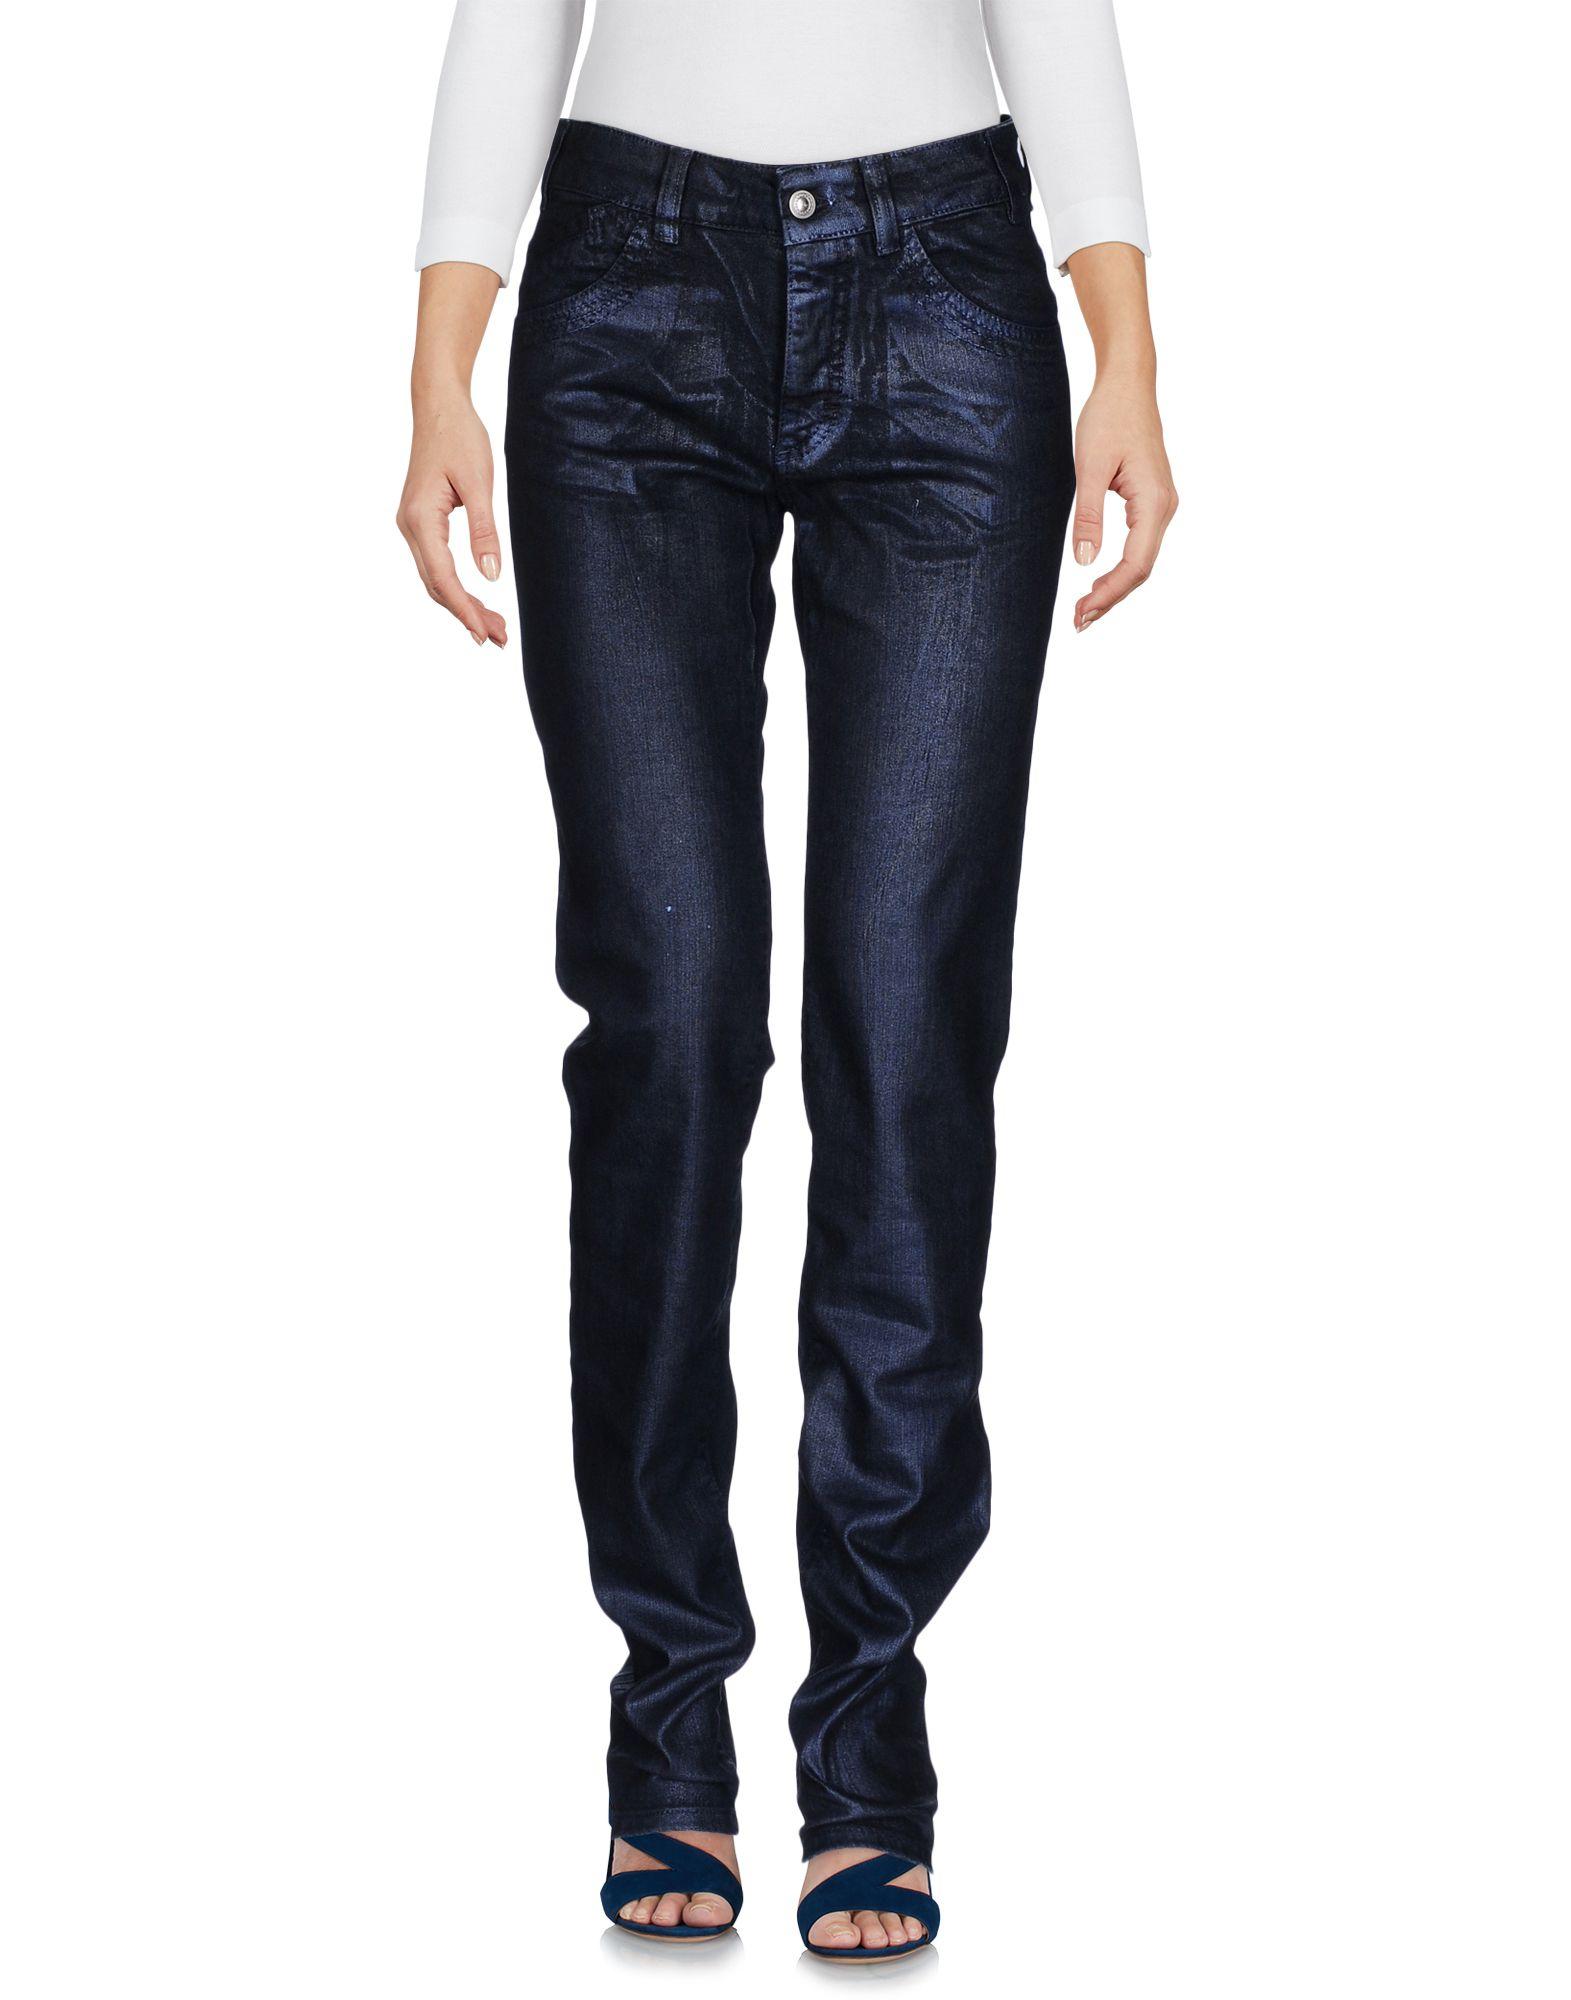 VERSACE JEANS COUTURE Damen Jeanshose Farbe Blau Größe 1 jetztbilligerkaufen